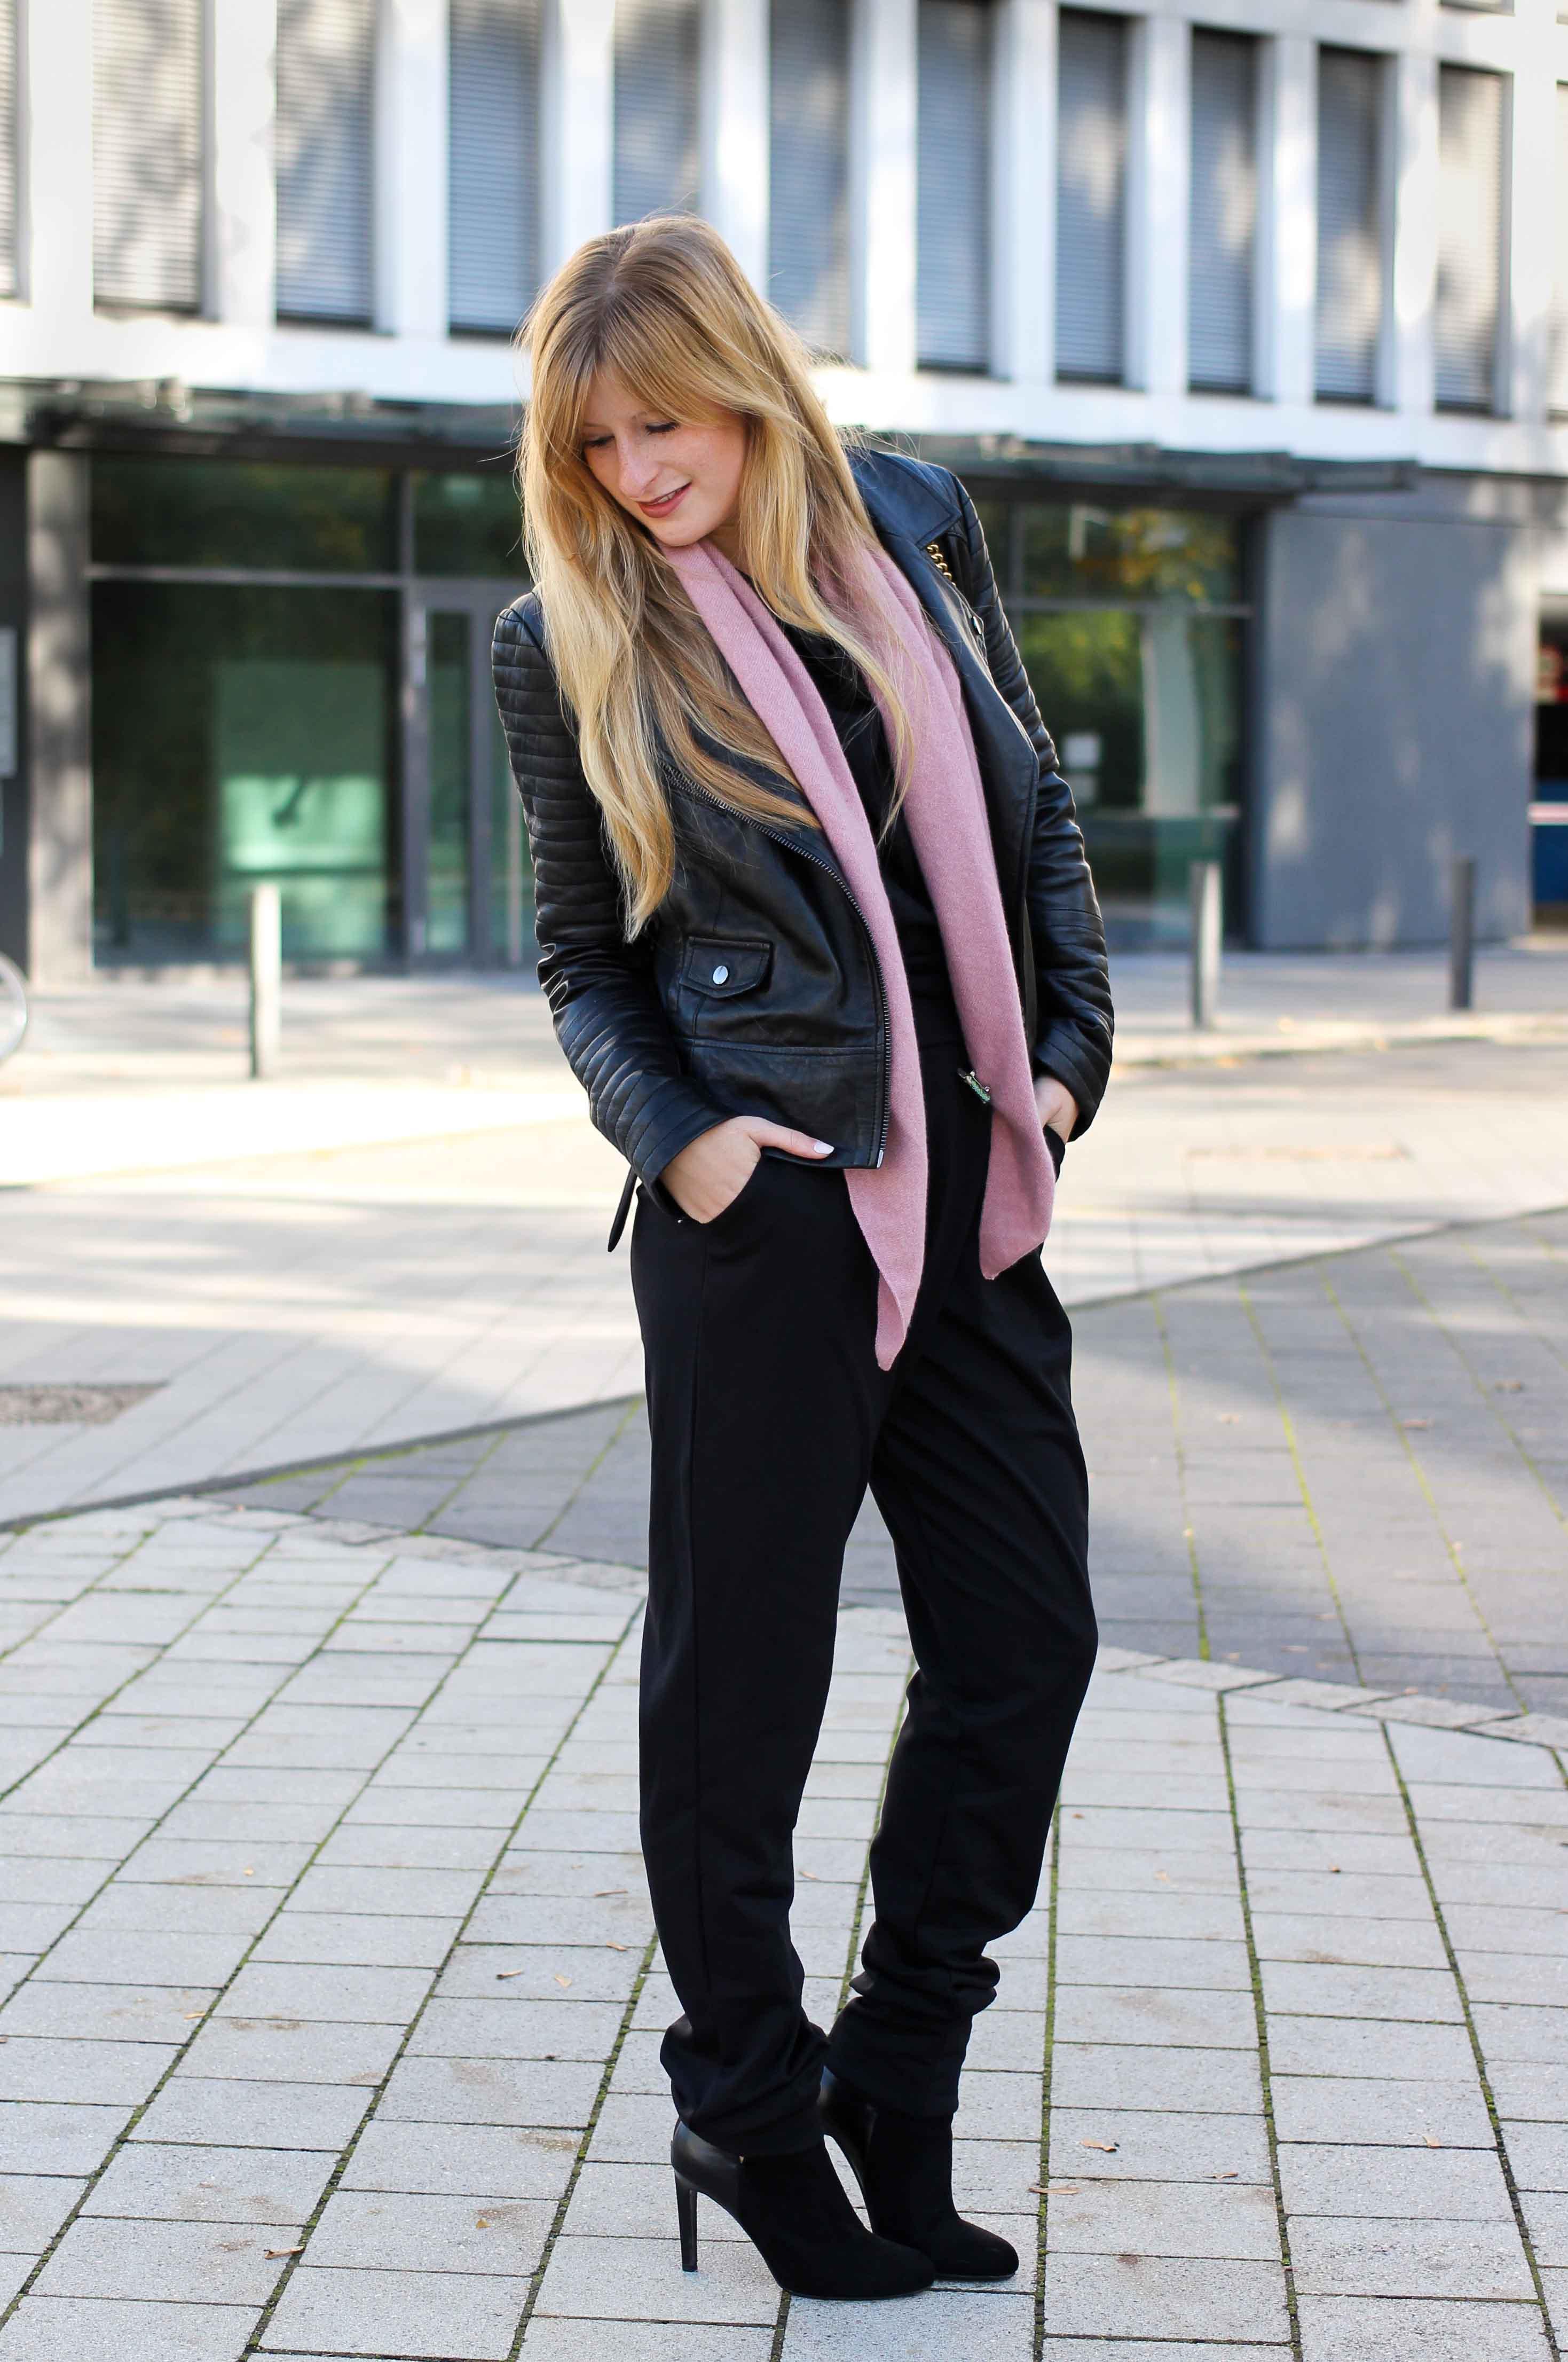 Schwarzer Jumpsuit rosa Kaschmir Schal Gucci Dionysus Garden Print Lederjacke Modeblog Outfit Herbsttrend 1